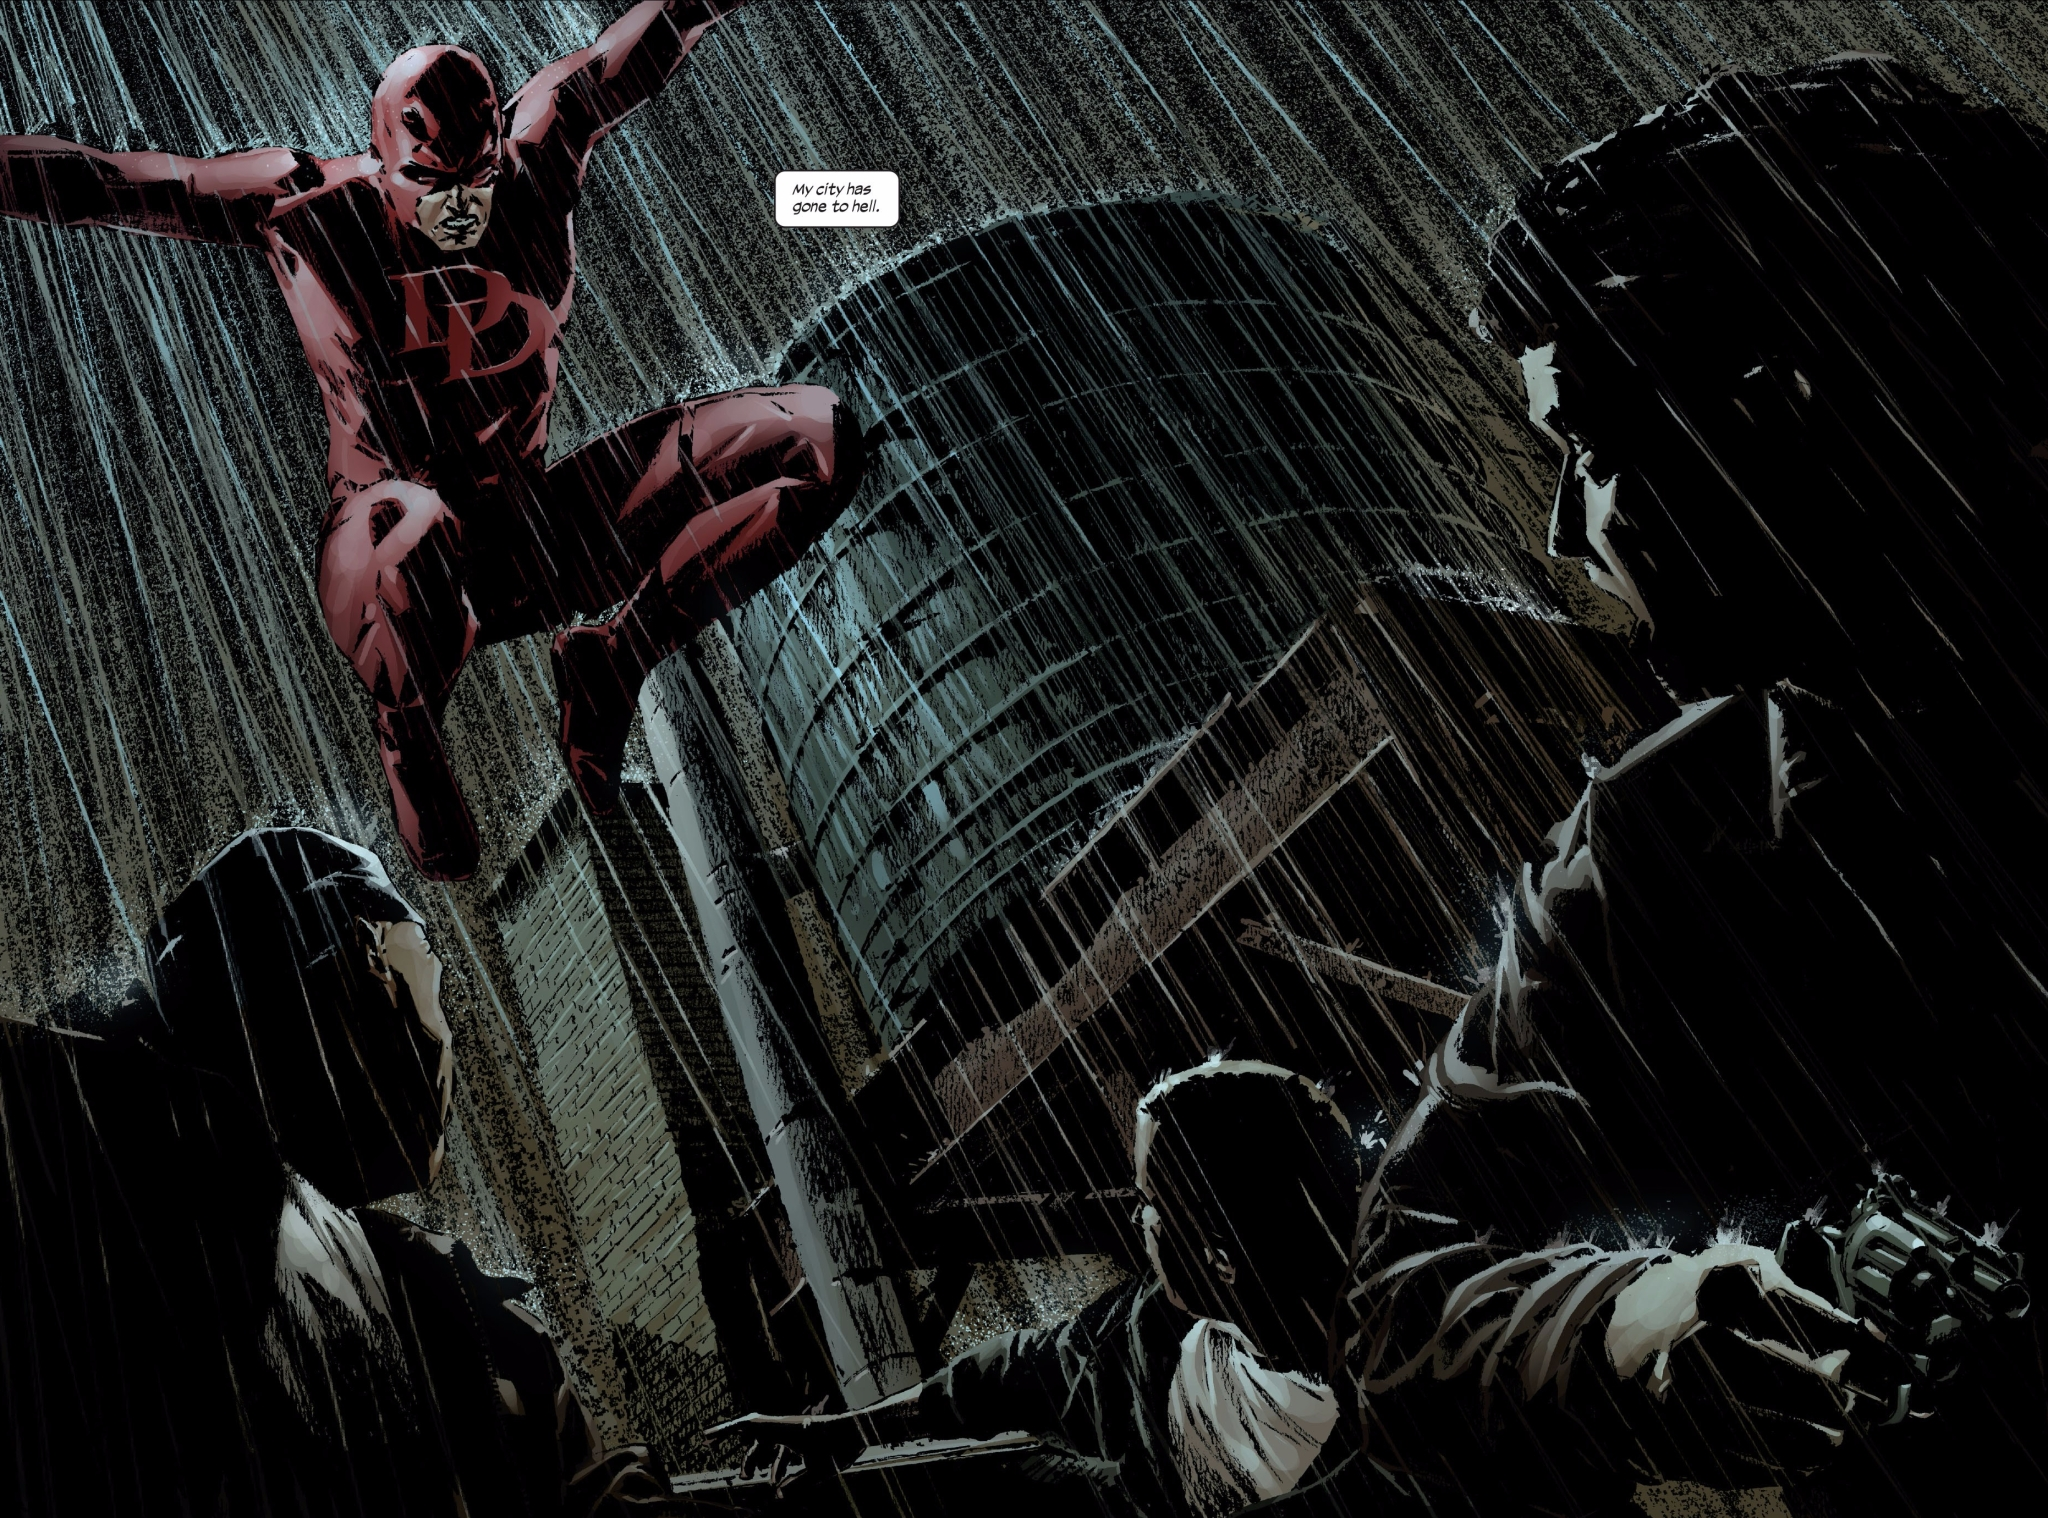 Daredevil by Brubaker and Lark